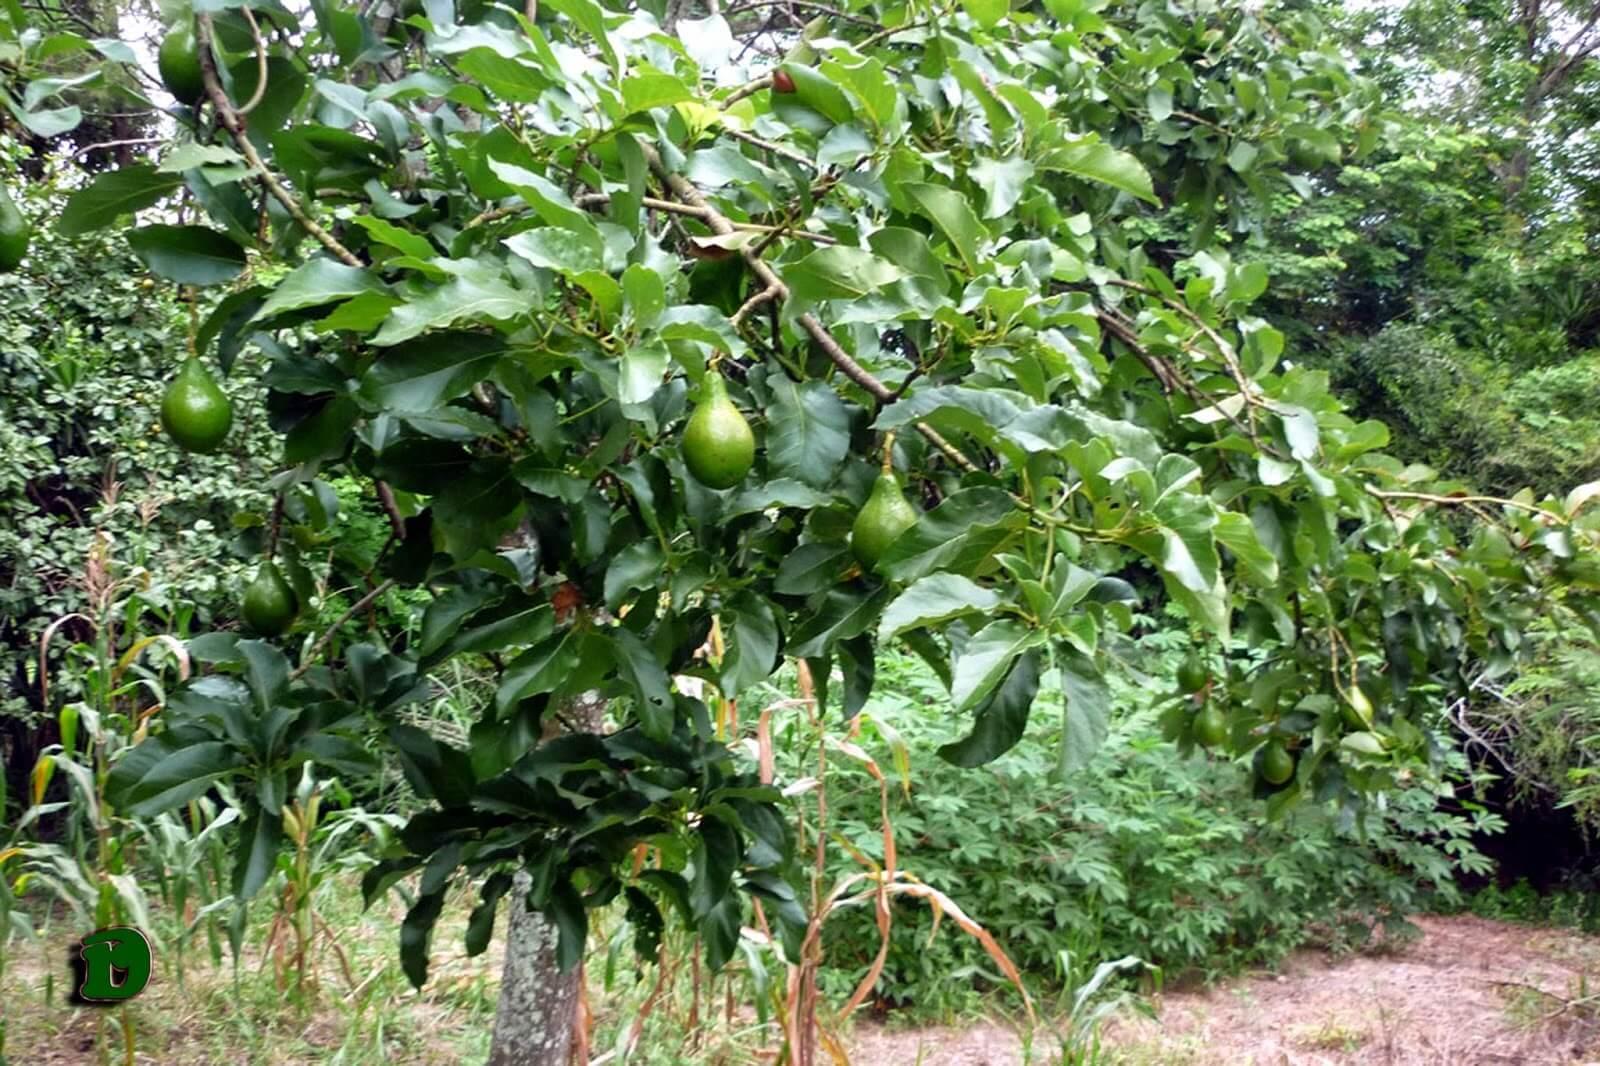 Muda Frutífera de Abacate - 1,2/1,5 m